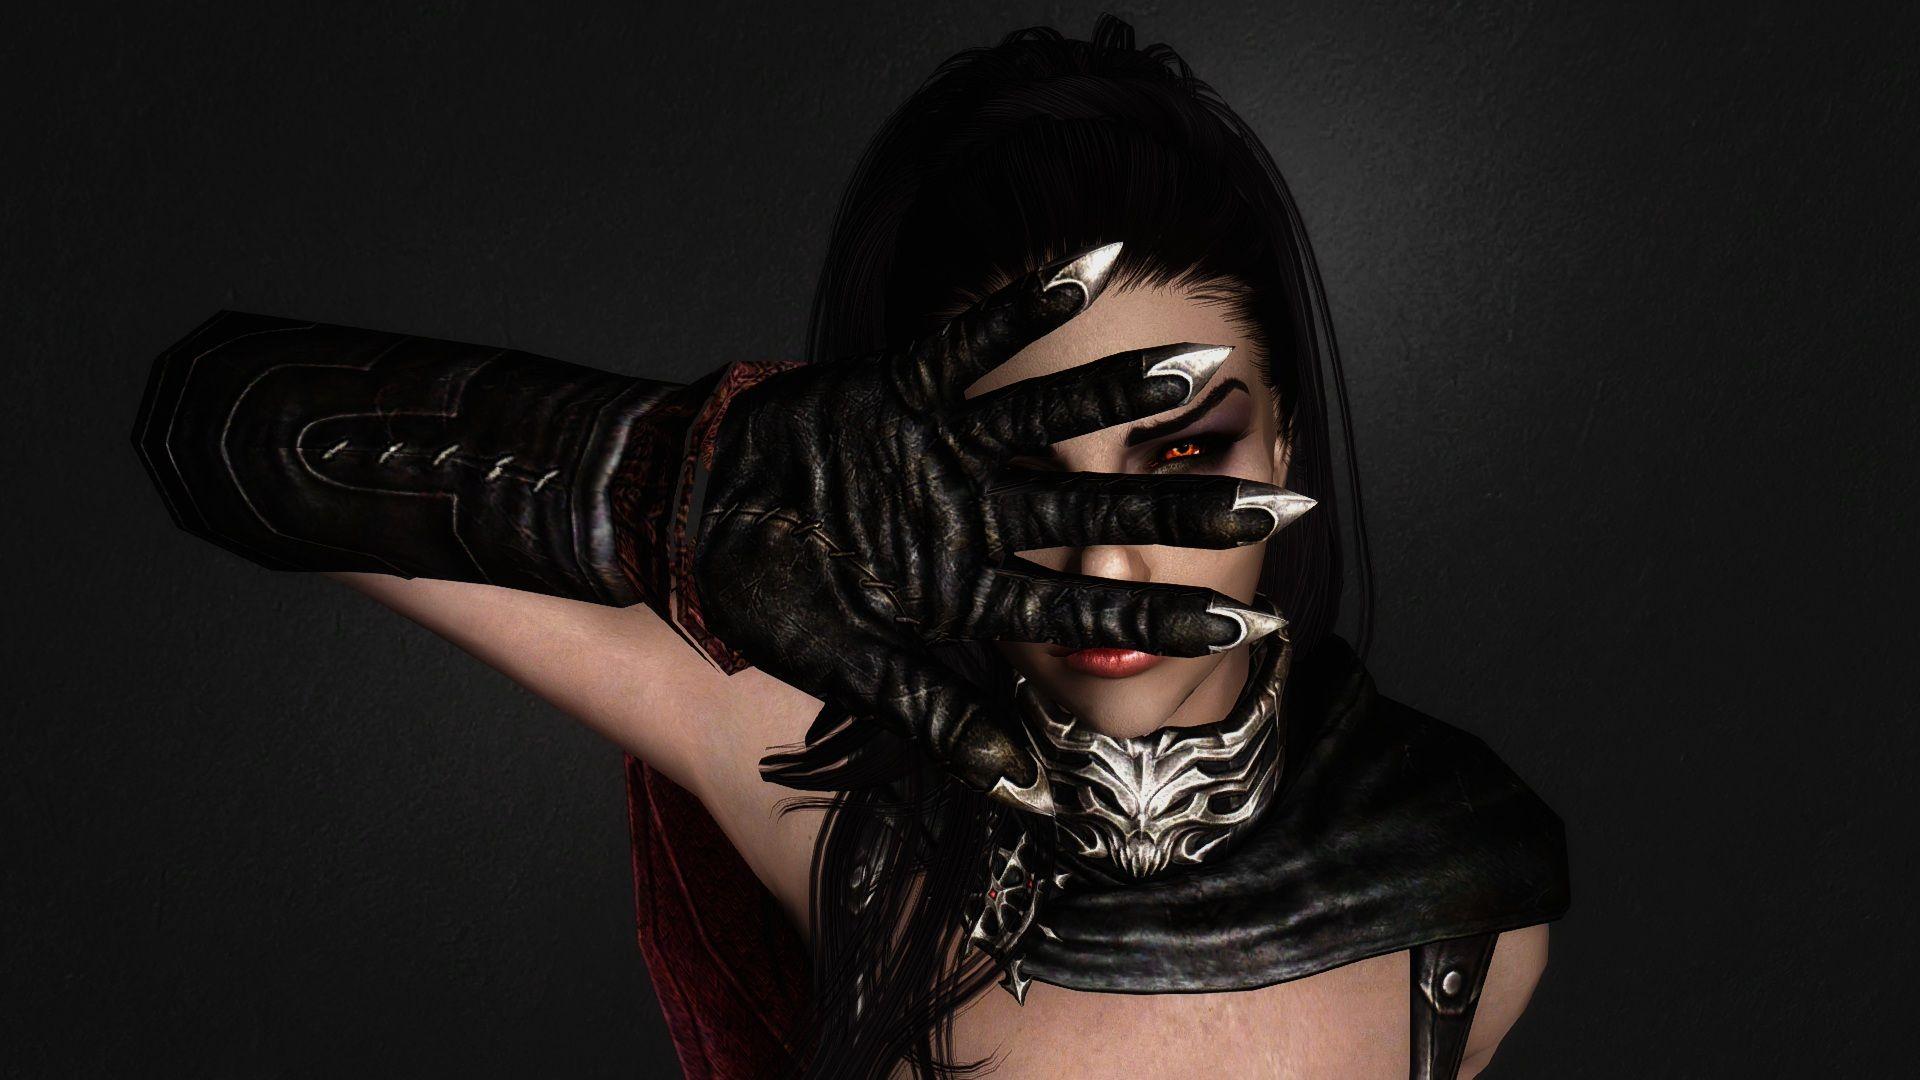 Black leather gloves skyrim - Http Skyrim Pc Mods Blogspot Com Skyrim_beautification_project